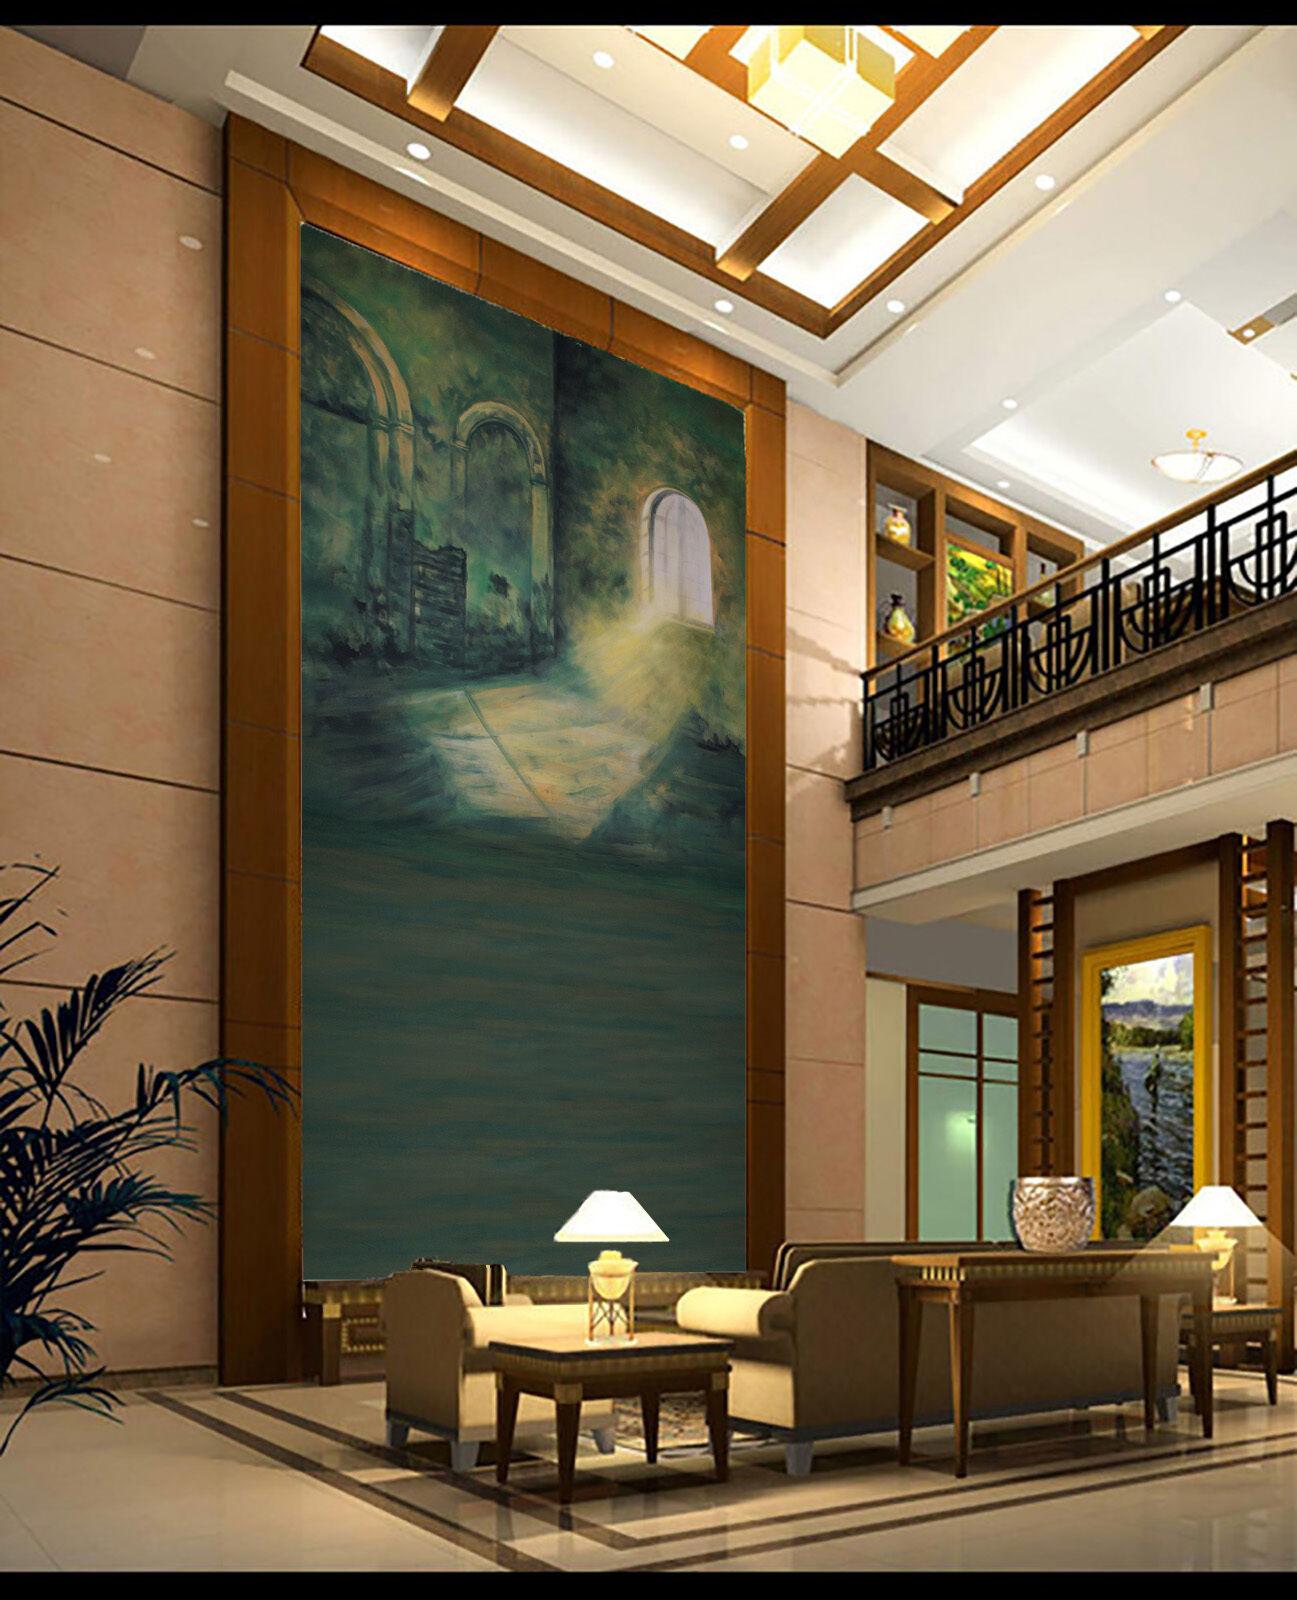 3D Ein sonnenstrahl  69798 Fototapeten Wandbild Fototapete BildTapete Familie DE